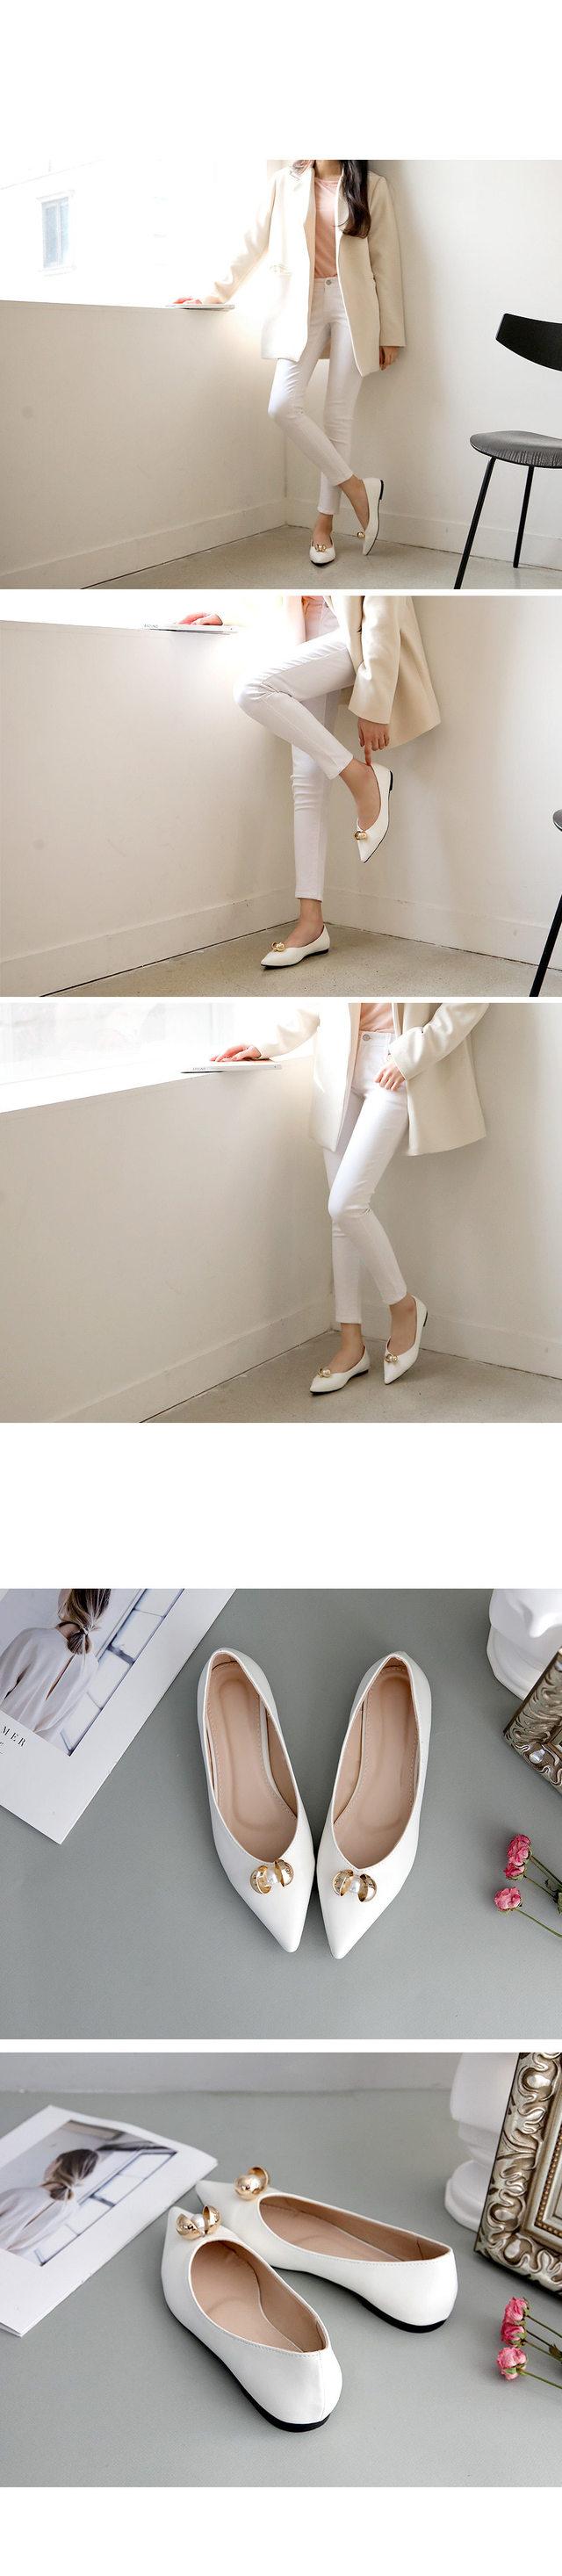 Nikael Flat Shoes 1cm